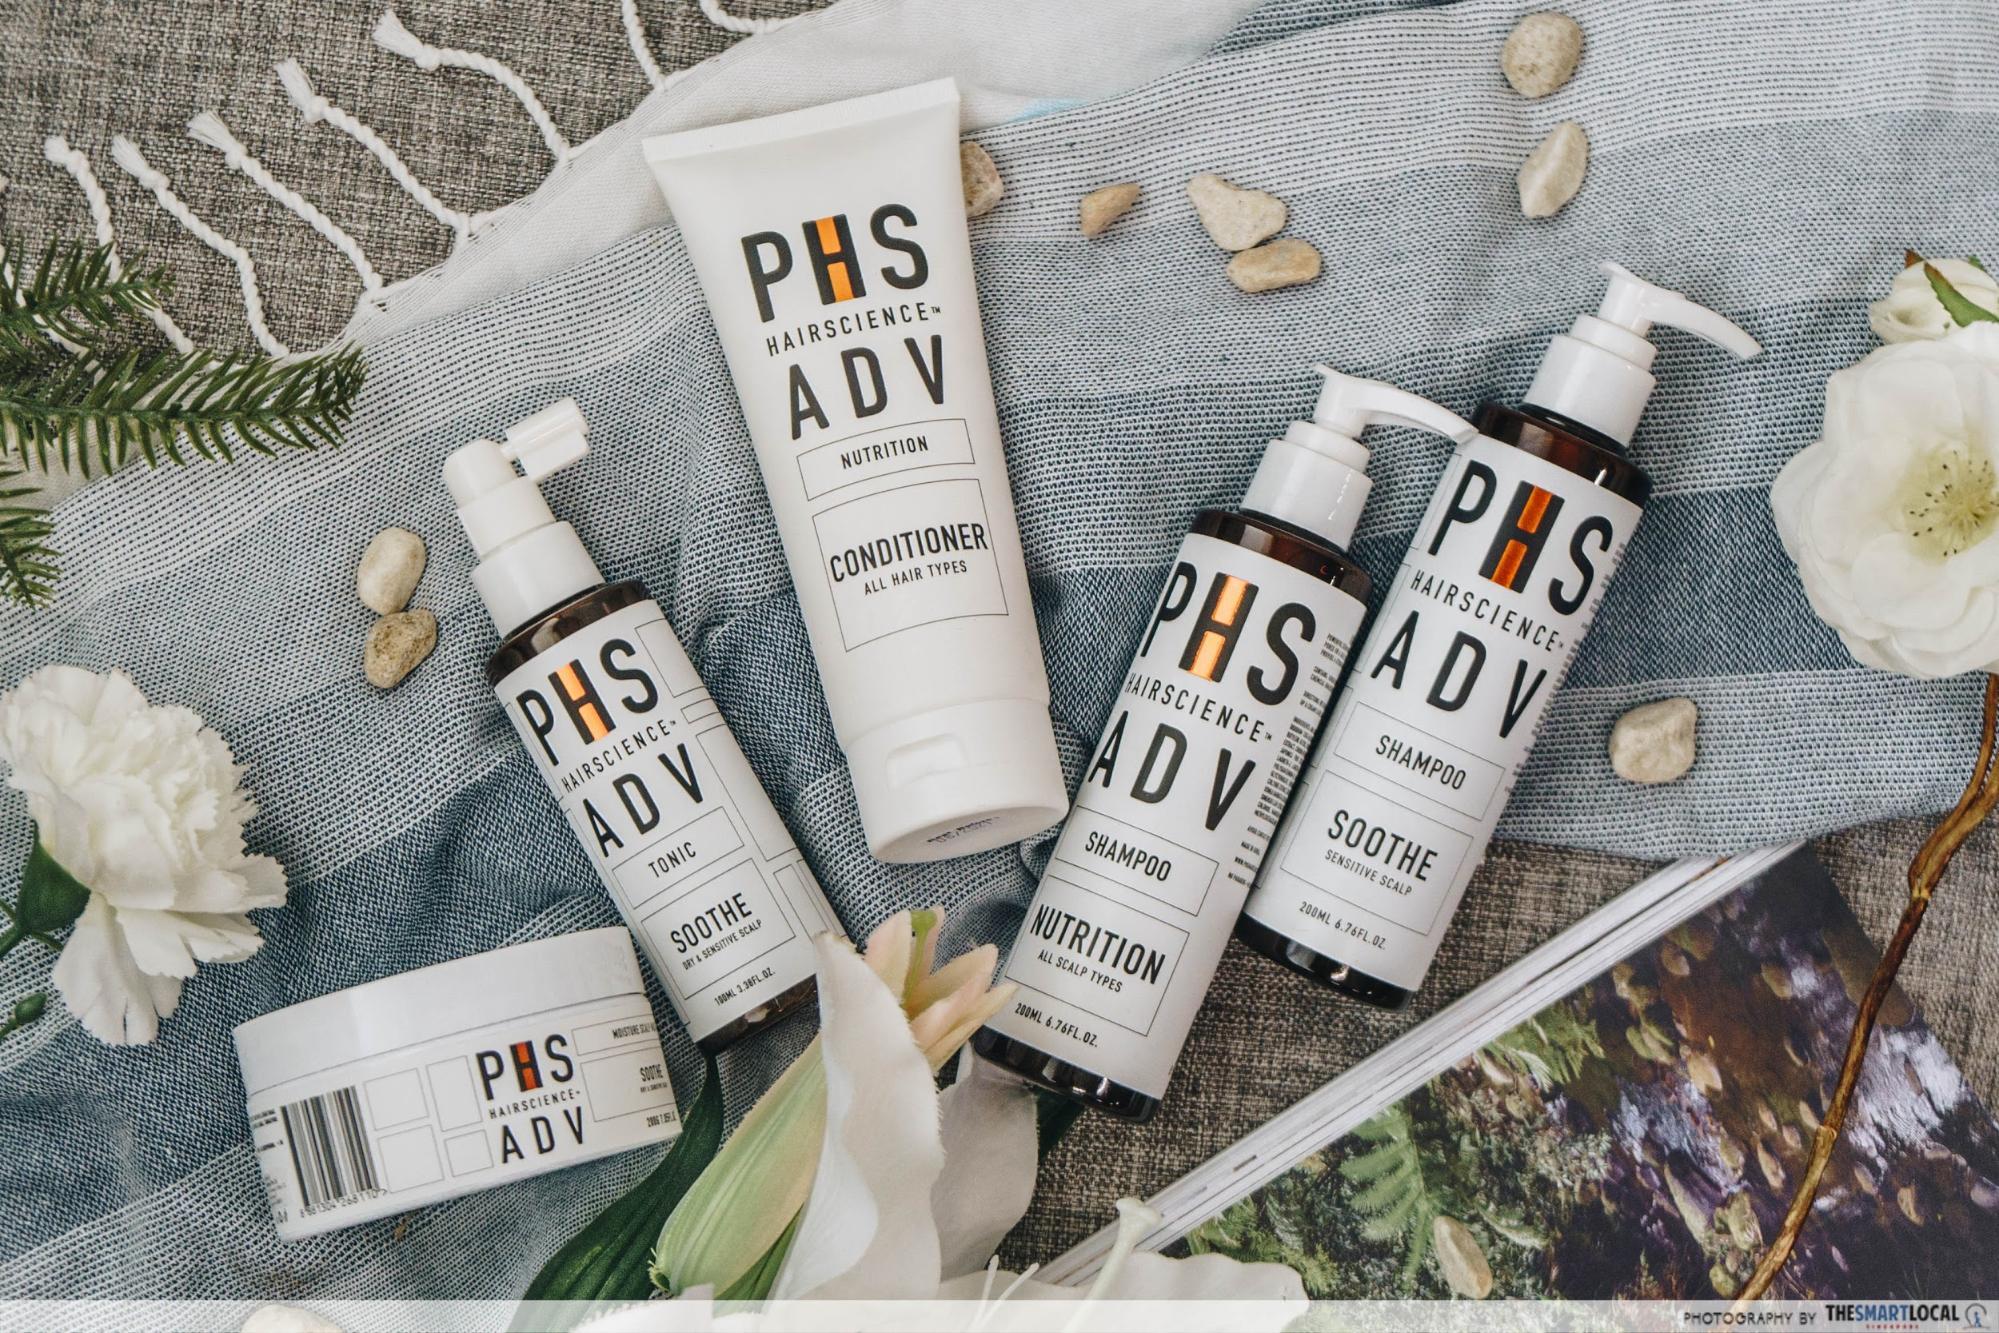 phs hairscience hair washing mistakes